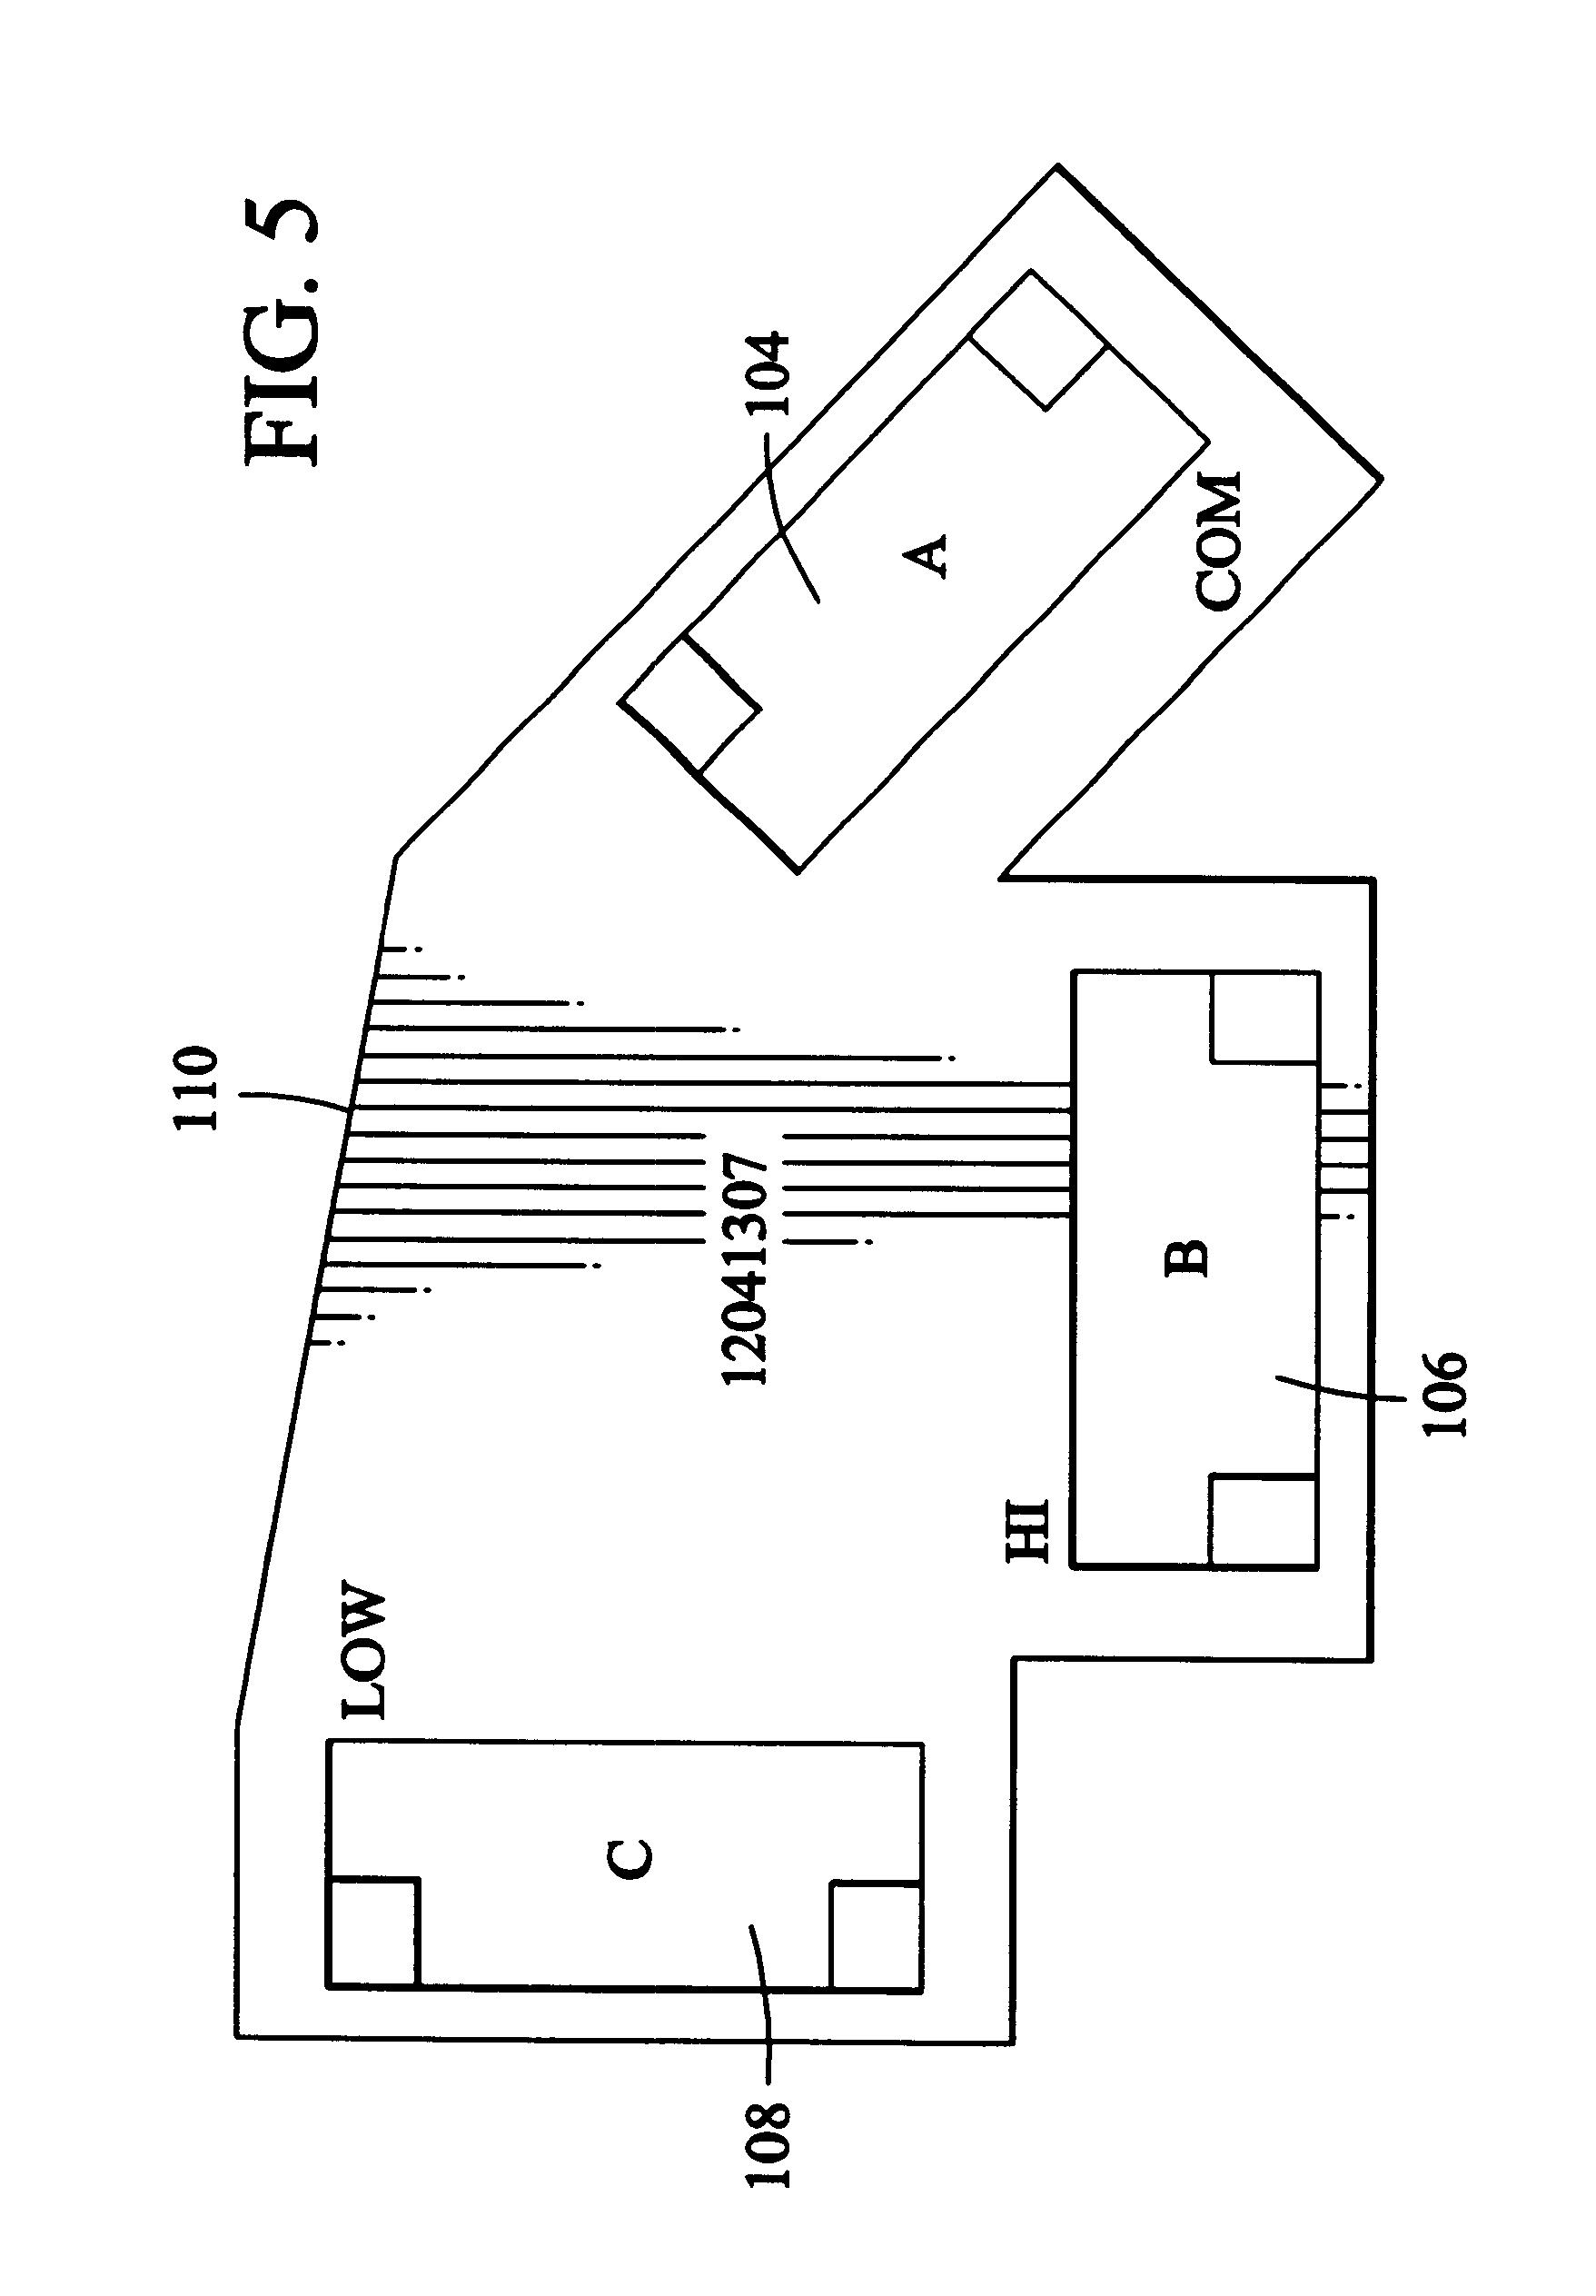 patent us6504306 - headlight adapter system